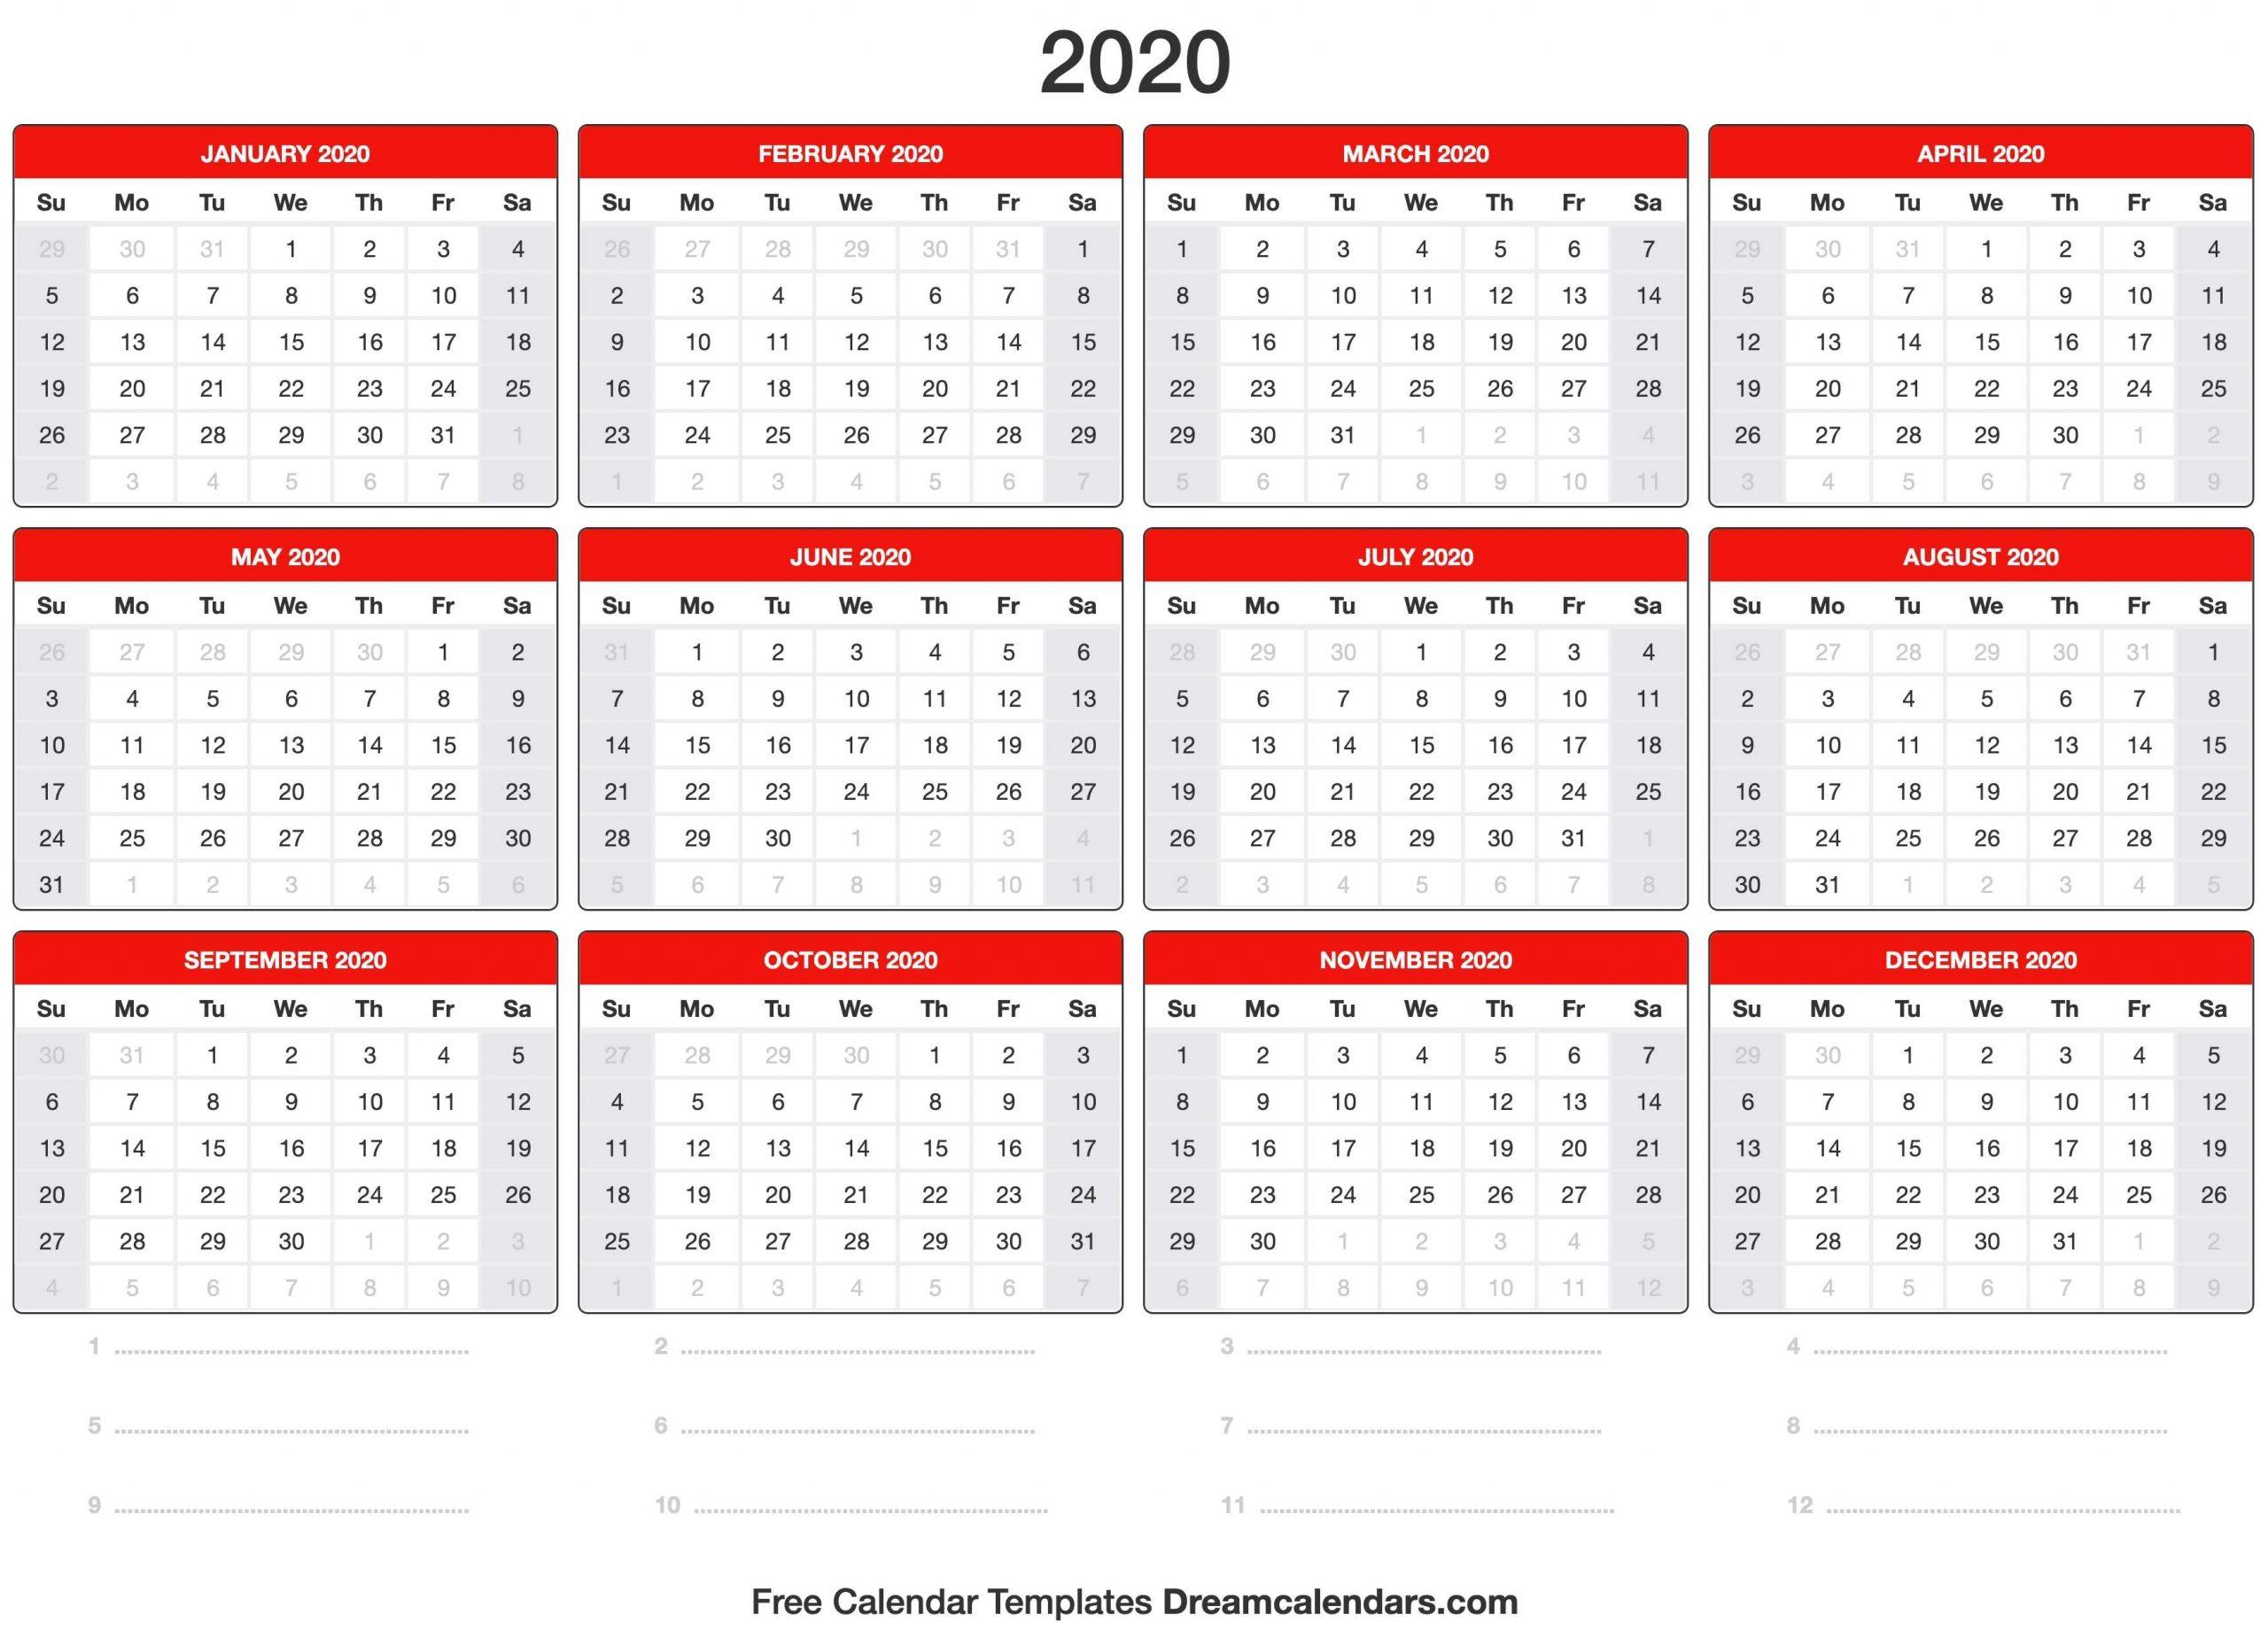 2020 Calender Year Week Wise - Calendar Inspiration Design